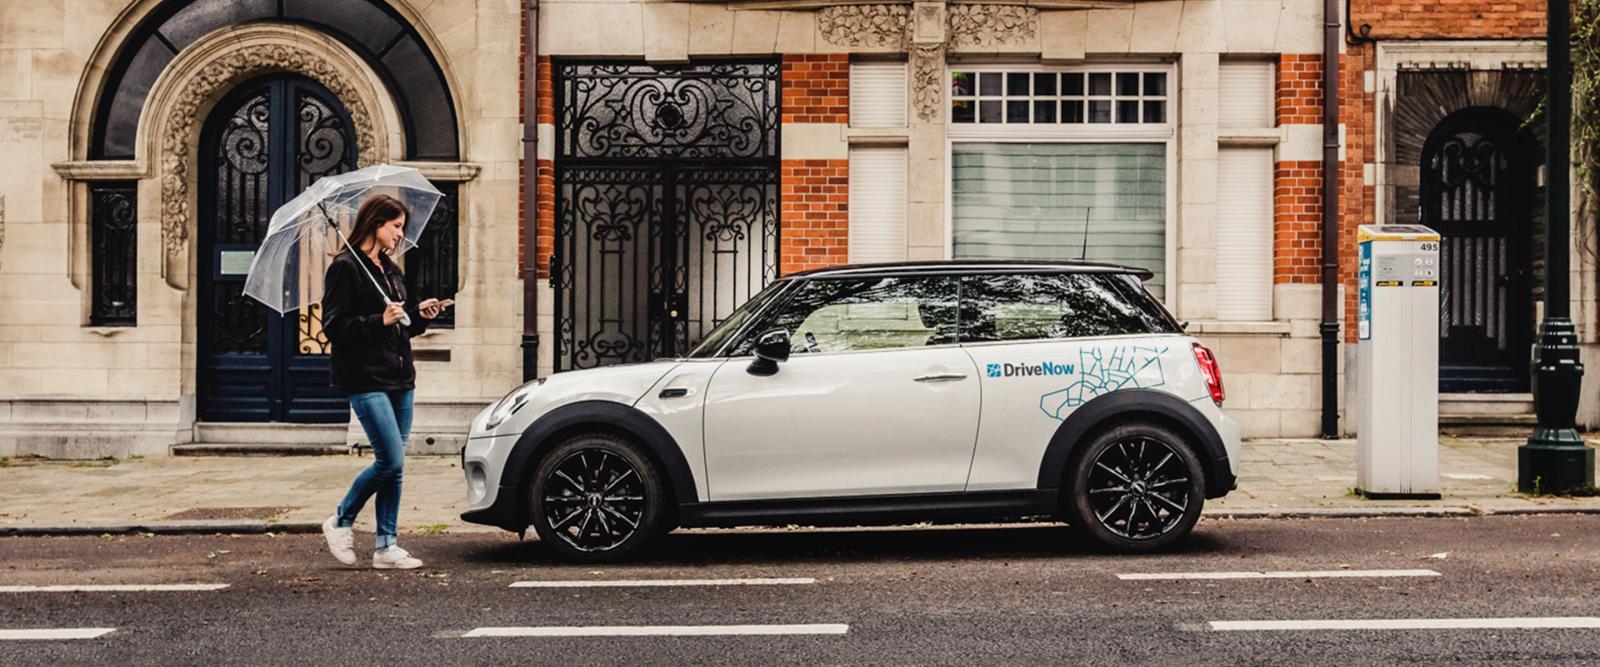 drivenow-carsharing-wien-miete-beenden